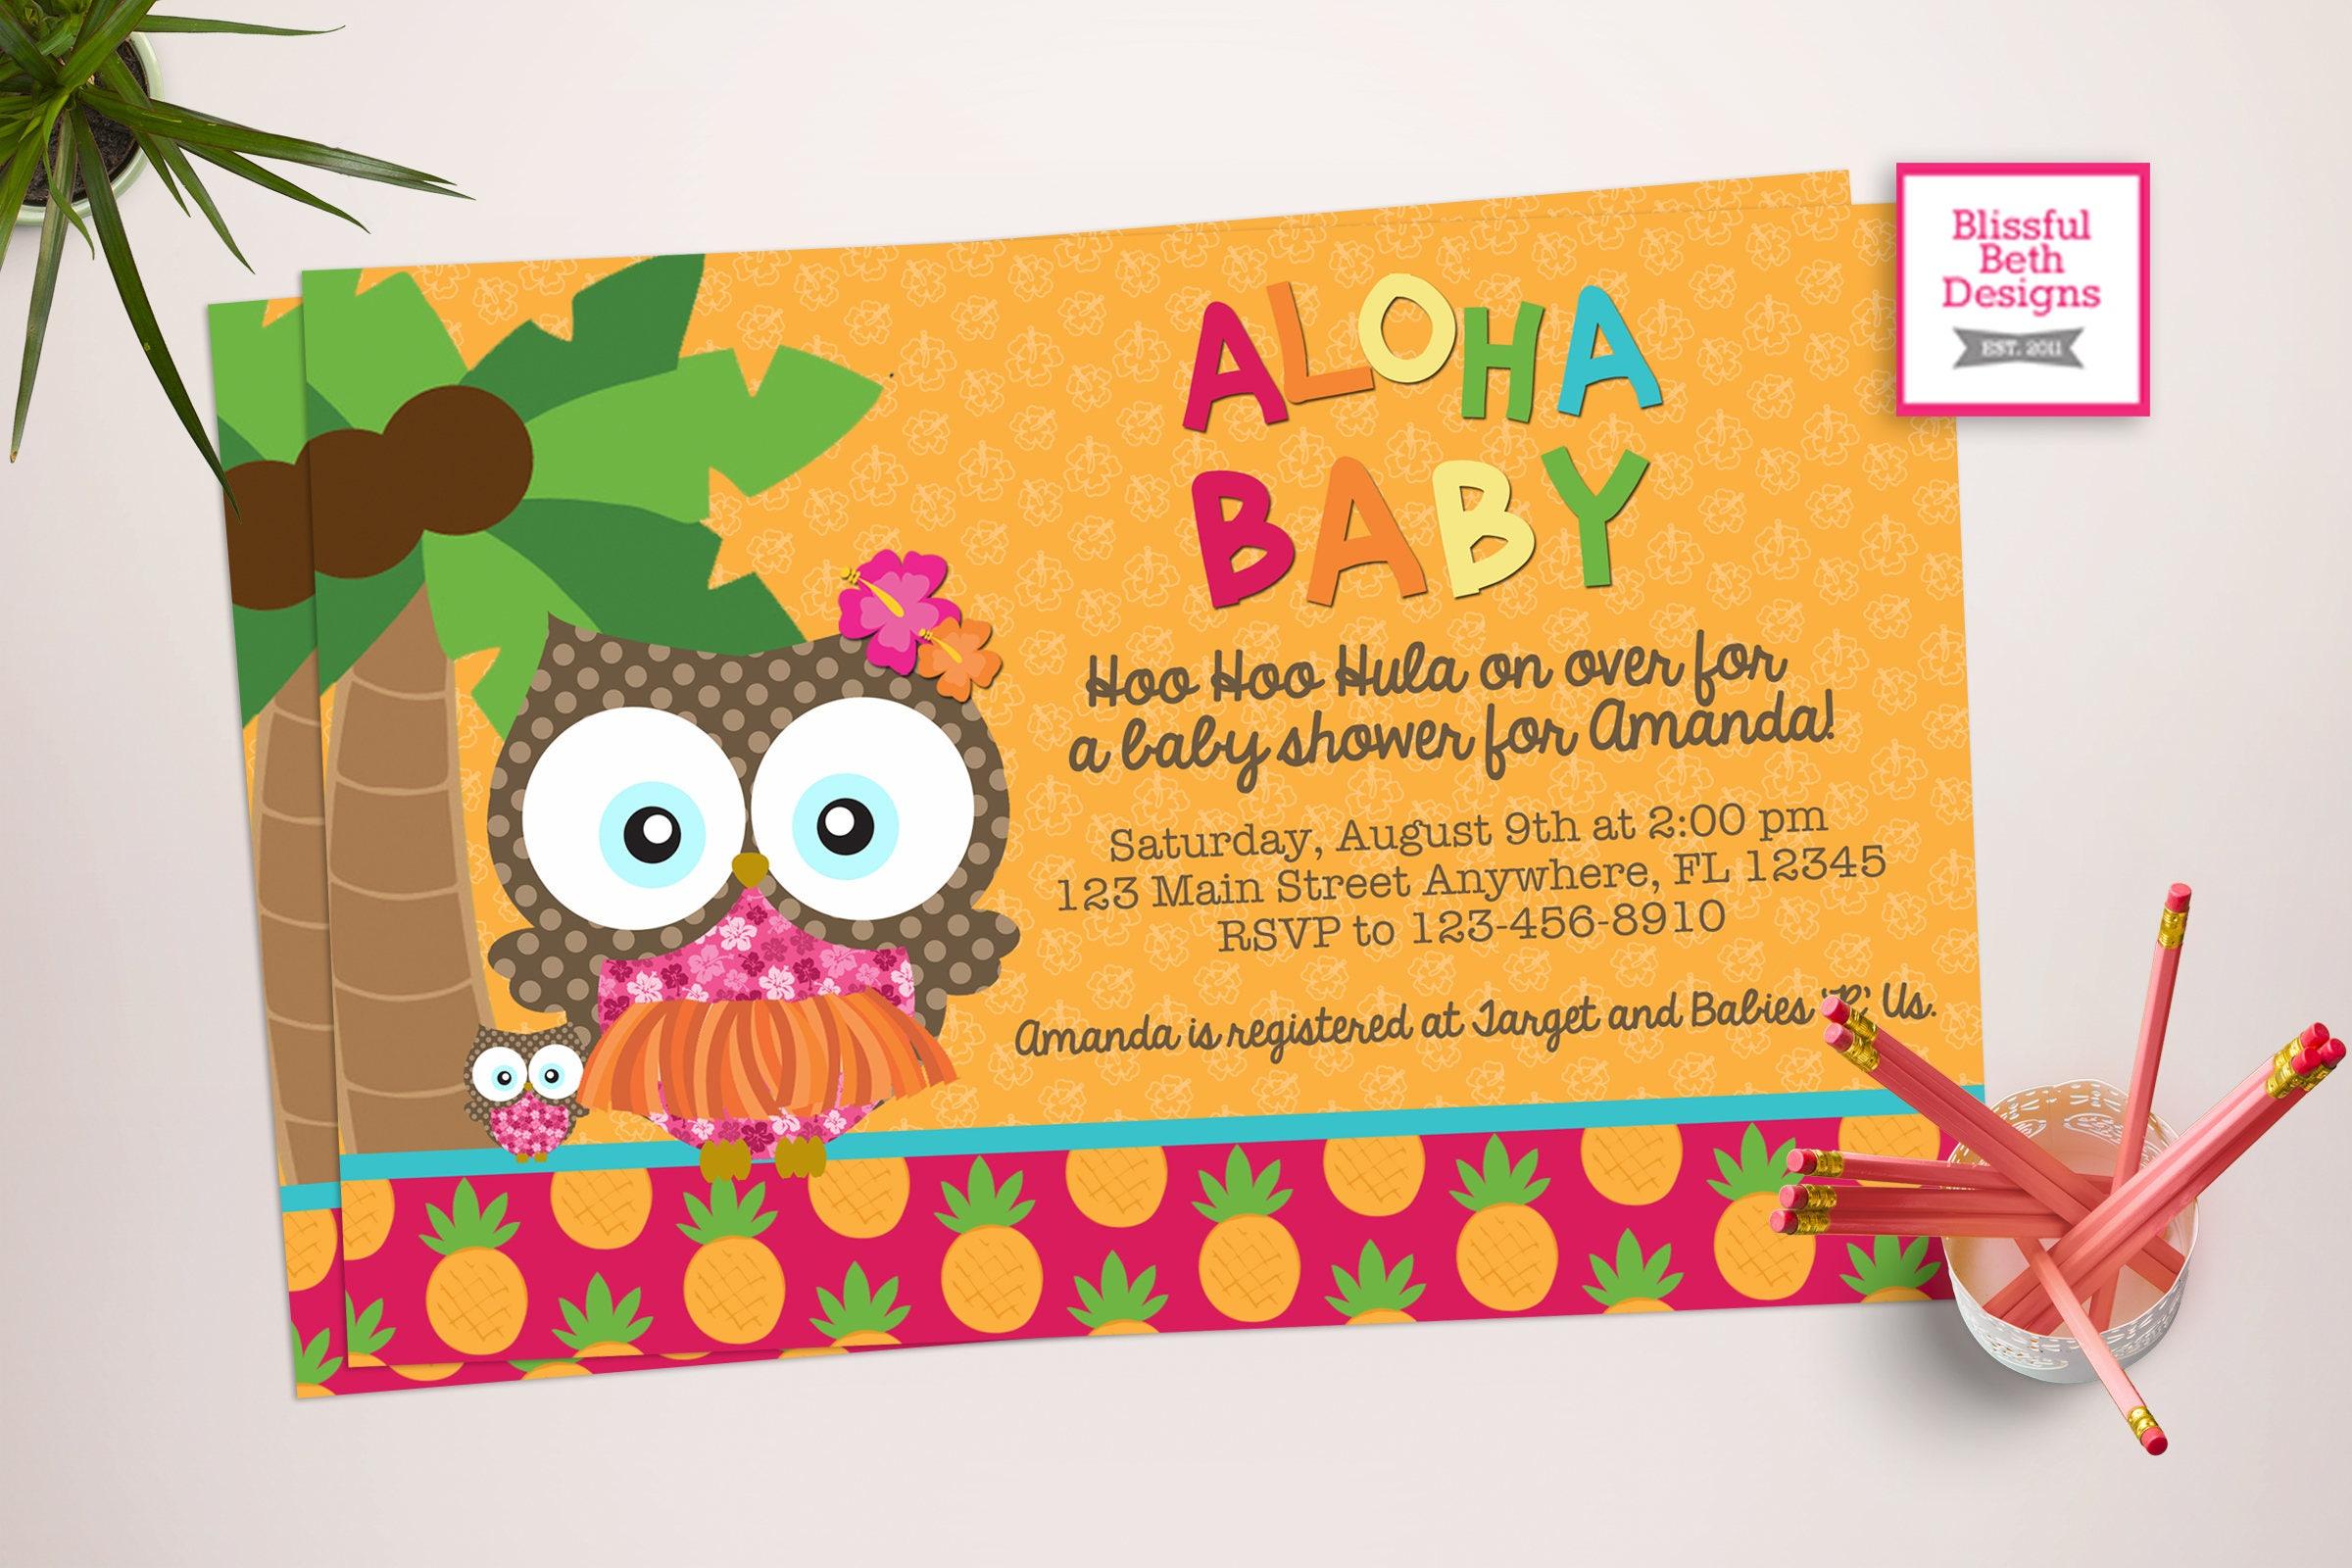 Aloha baby shower lu owl aloha baby luau owl owl shower owl aloha baby shower lu owl aloha baby luau owl owl shower owl invite luau invitation aloha owl invite luau shower aloha shower filmwisefo